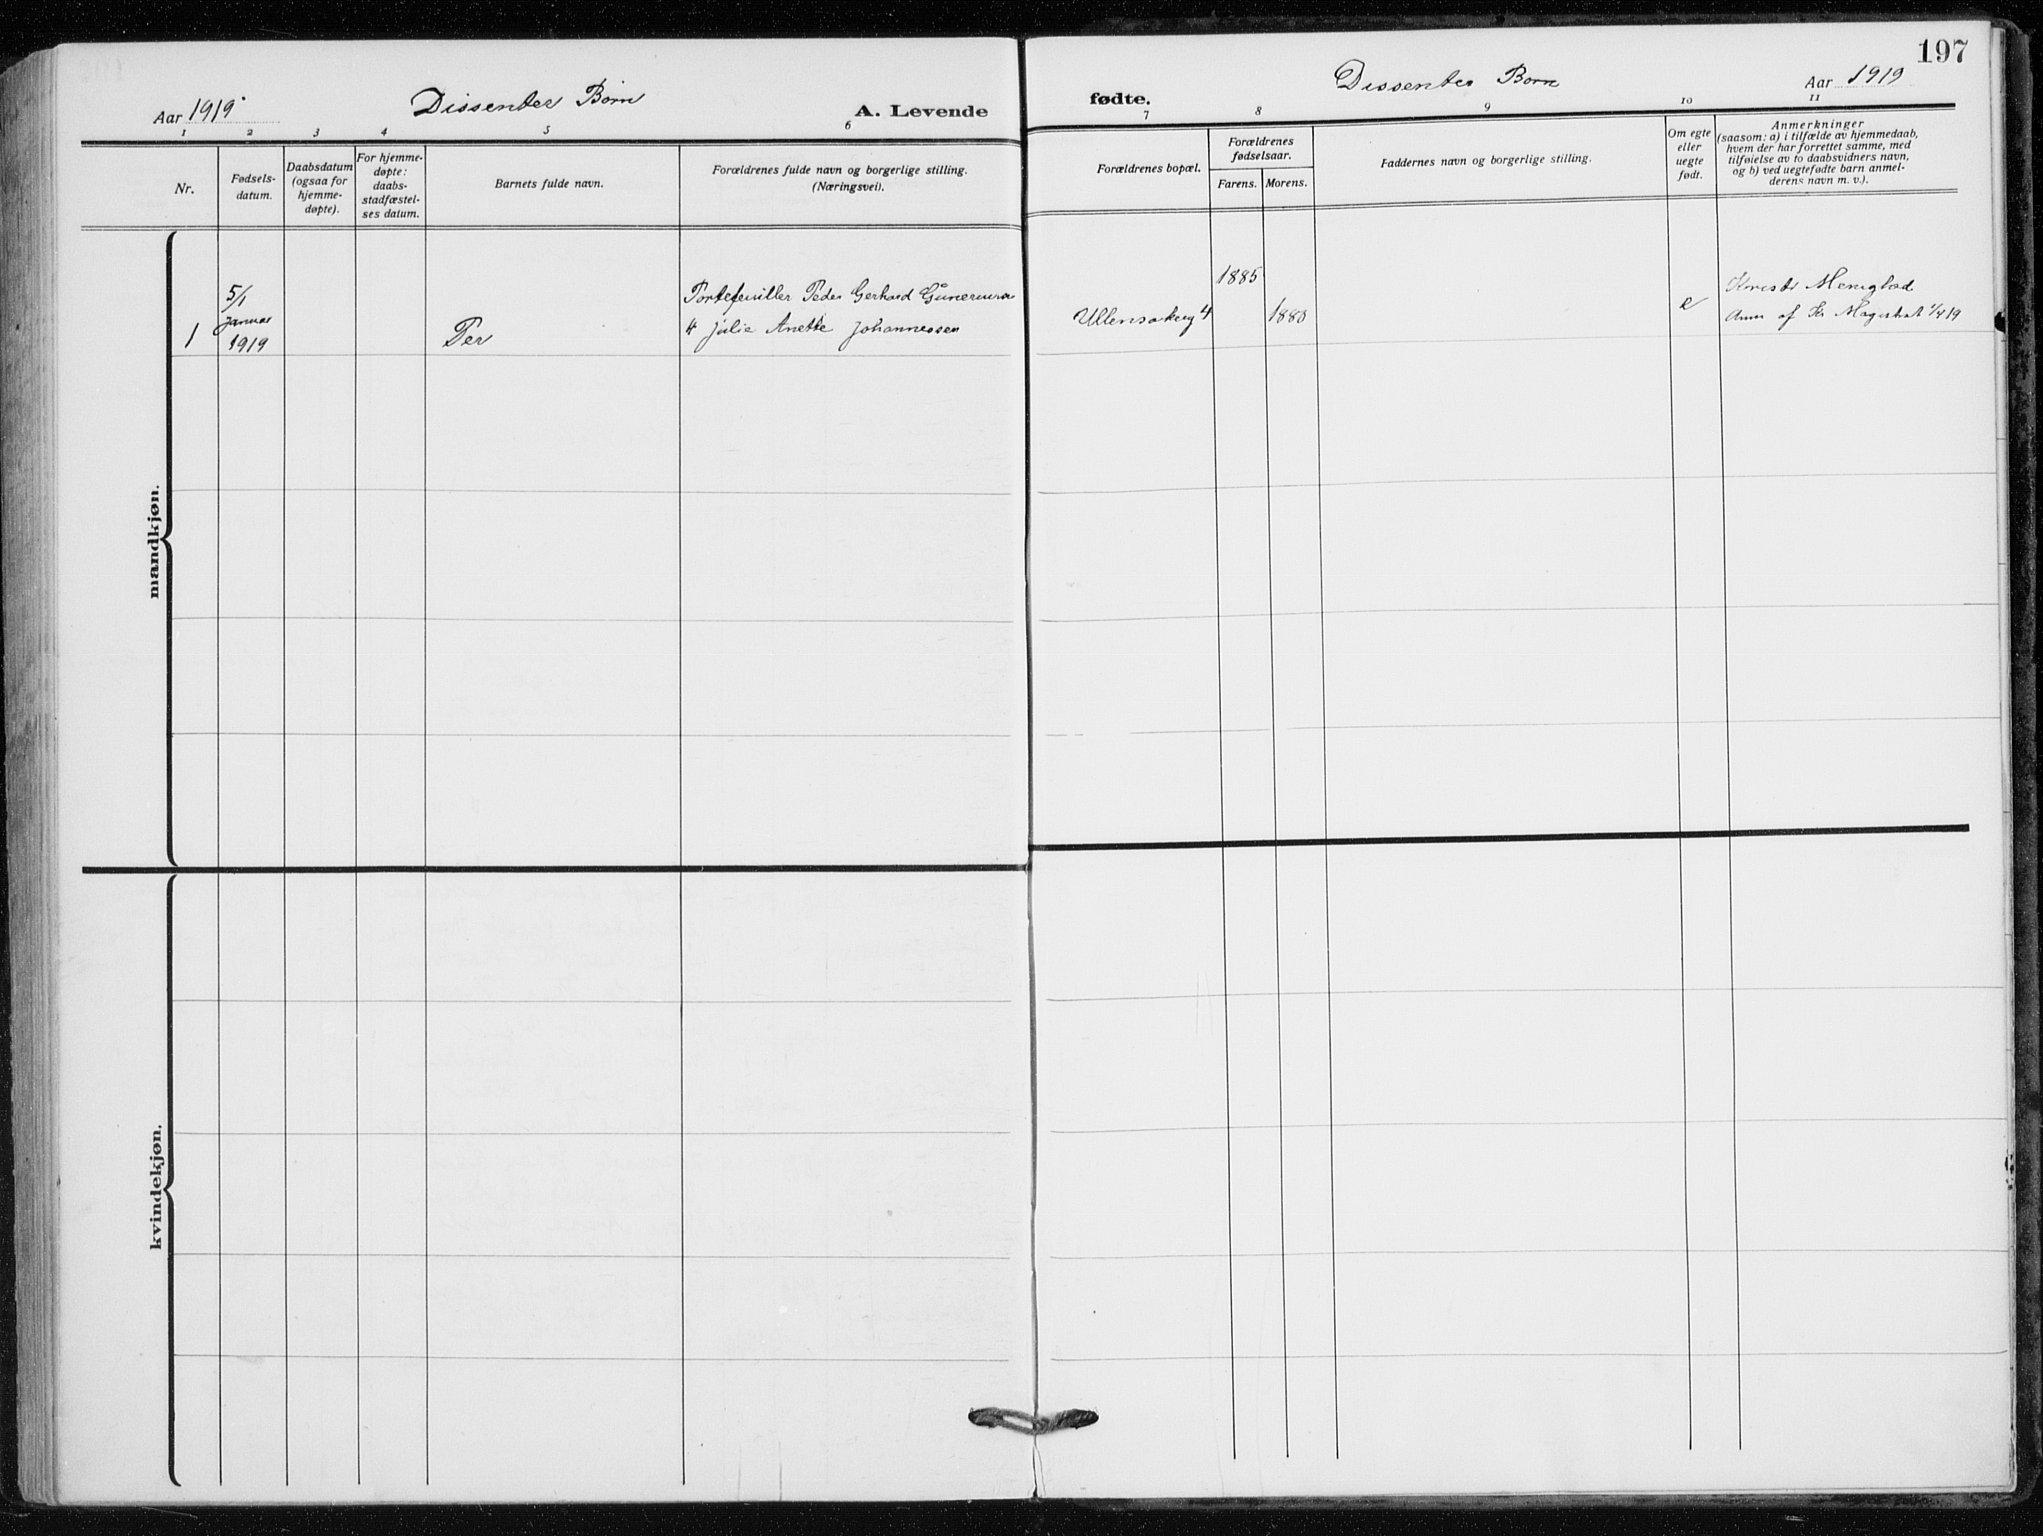 SAO, Kampen prestekontor Kirkebøker, F/Fa/L0012: Ministerialbok nr. I 12, 1916-1921, s. 197